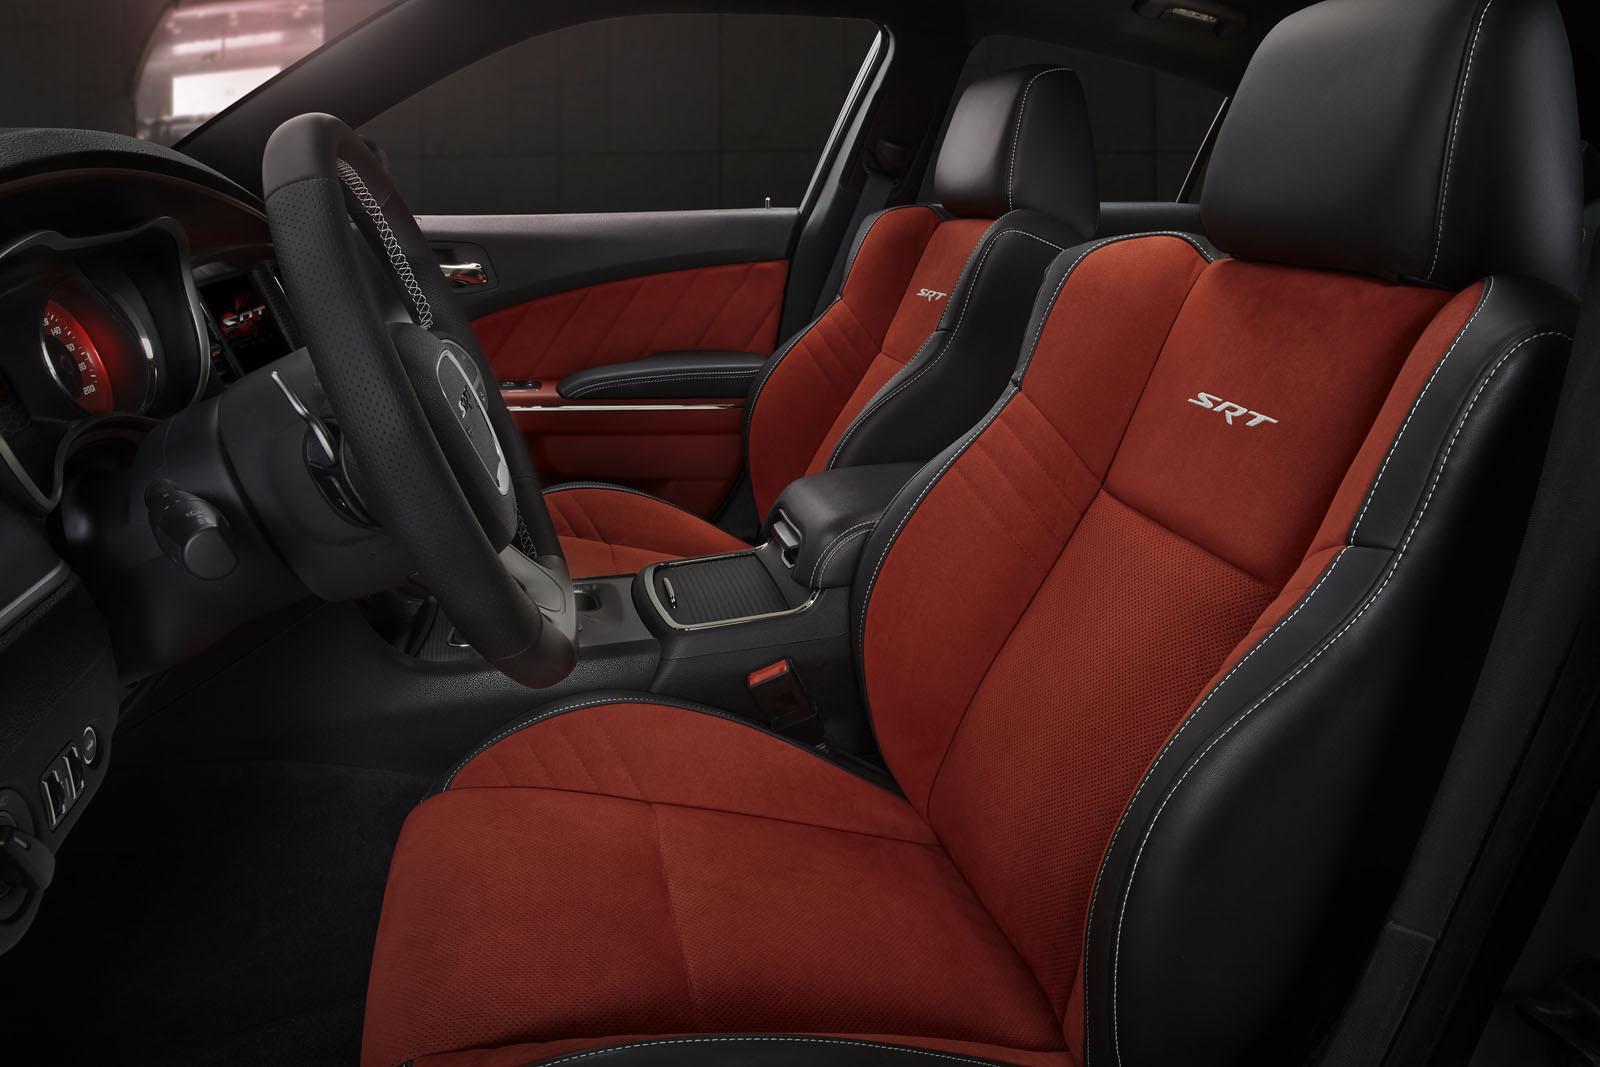 2015 Dodge Charger Srt Hellcat Seats